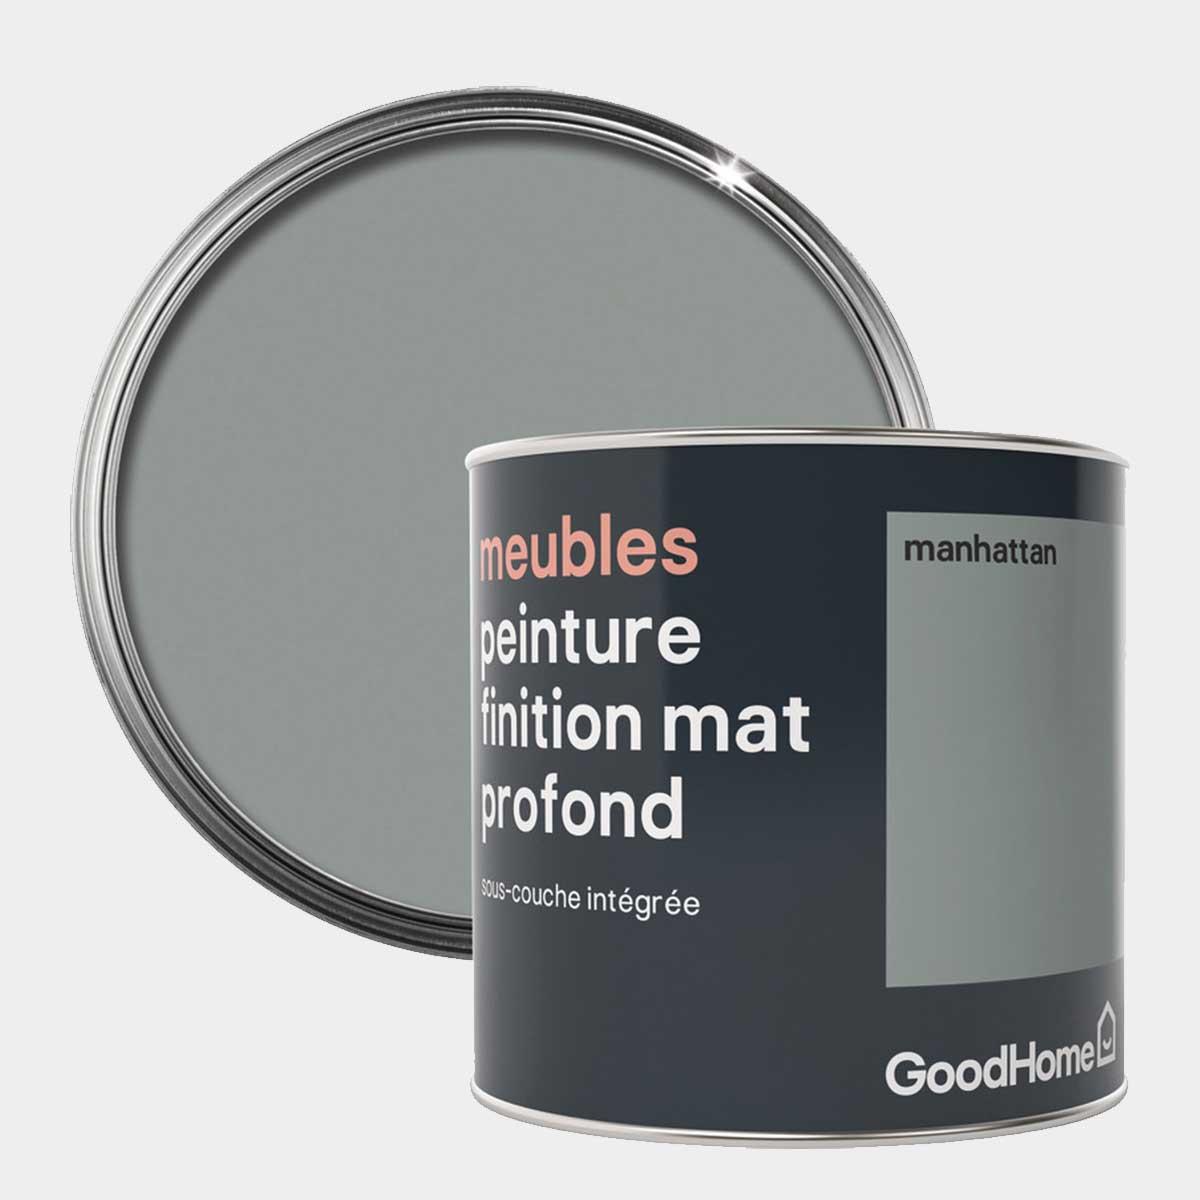 Peinture de rénovation meubles aspect mat profond gris Manhattan 0,5 l